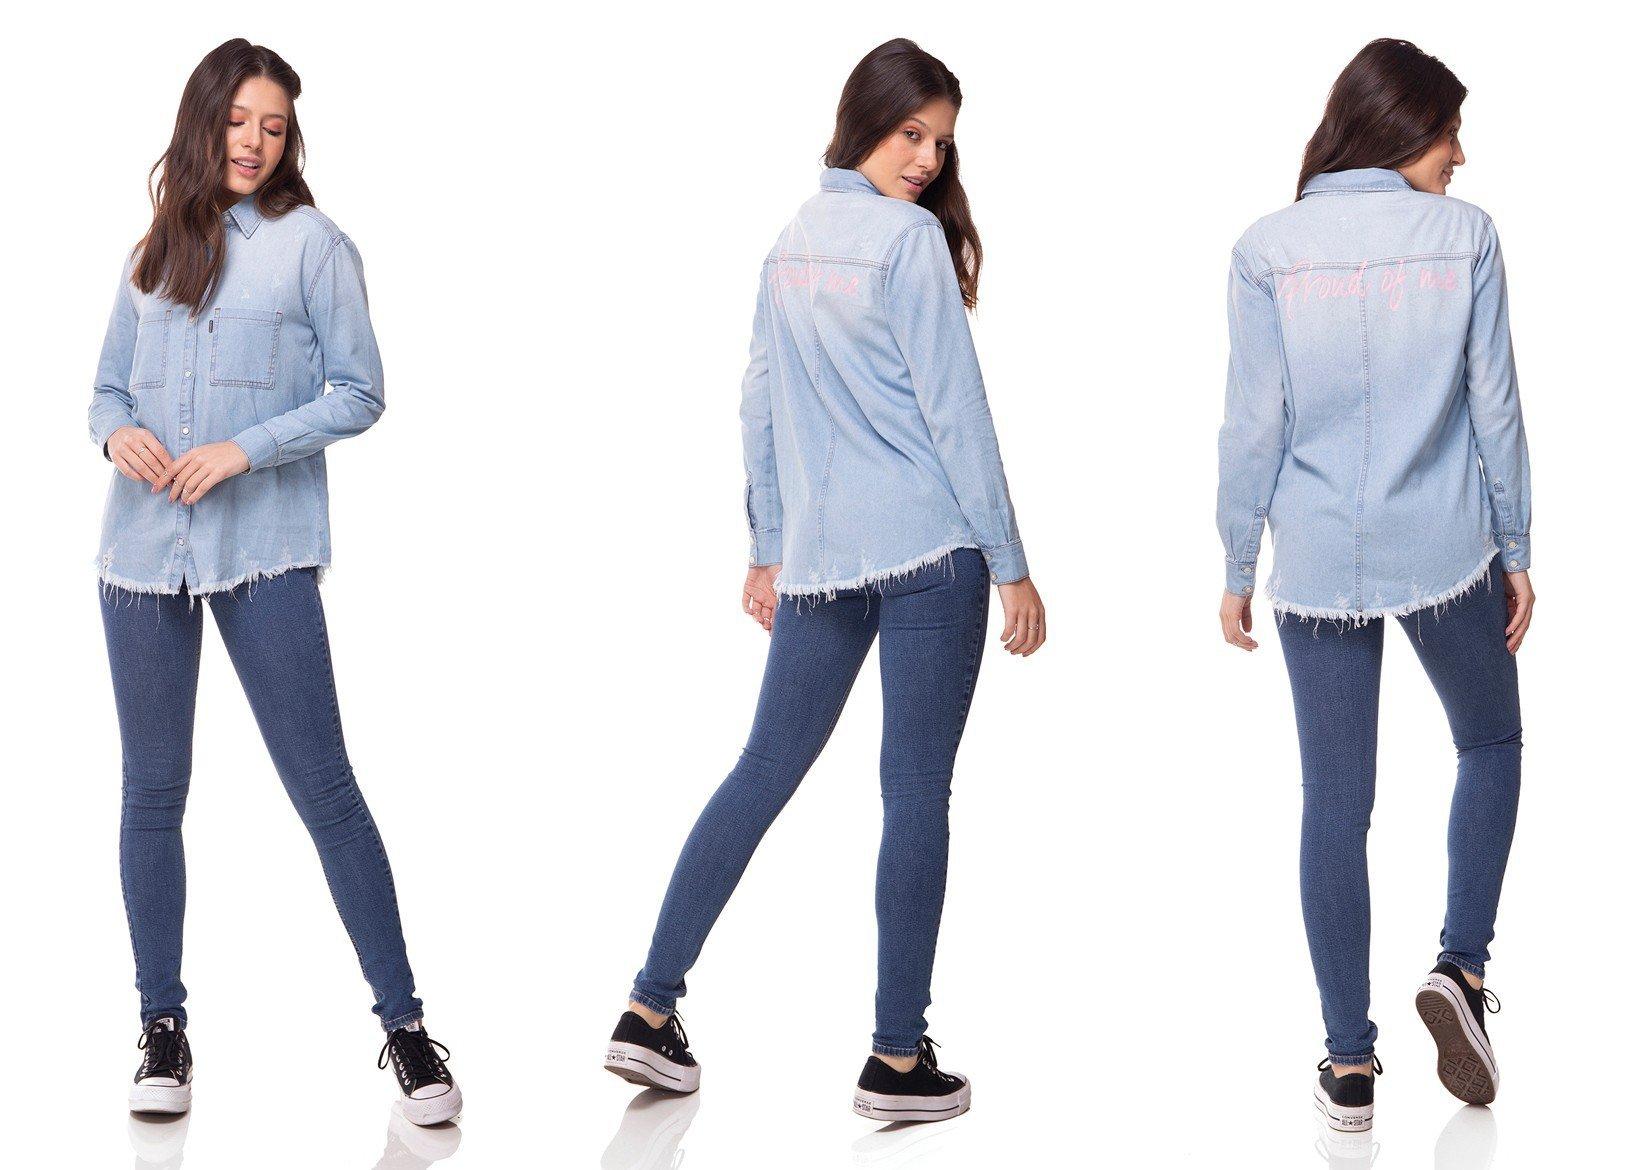 dz11142 camisa jeans oversize clara denim zero tripla